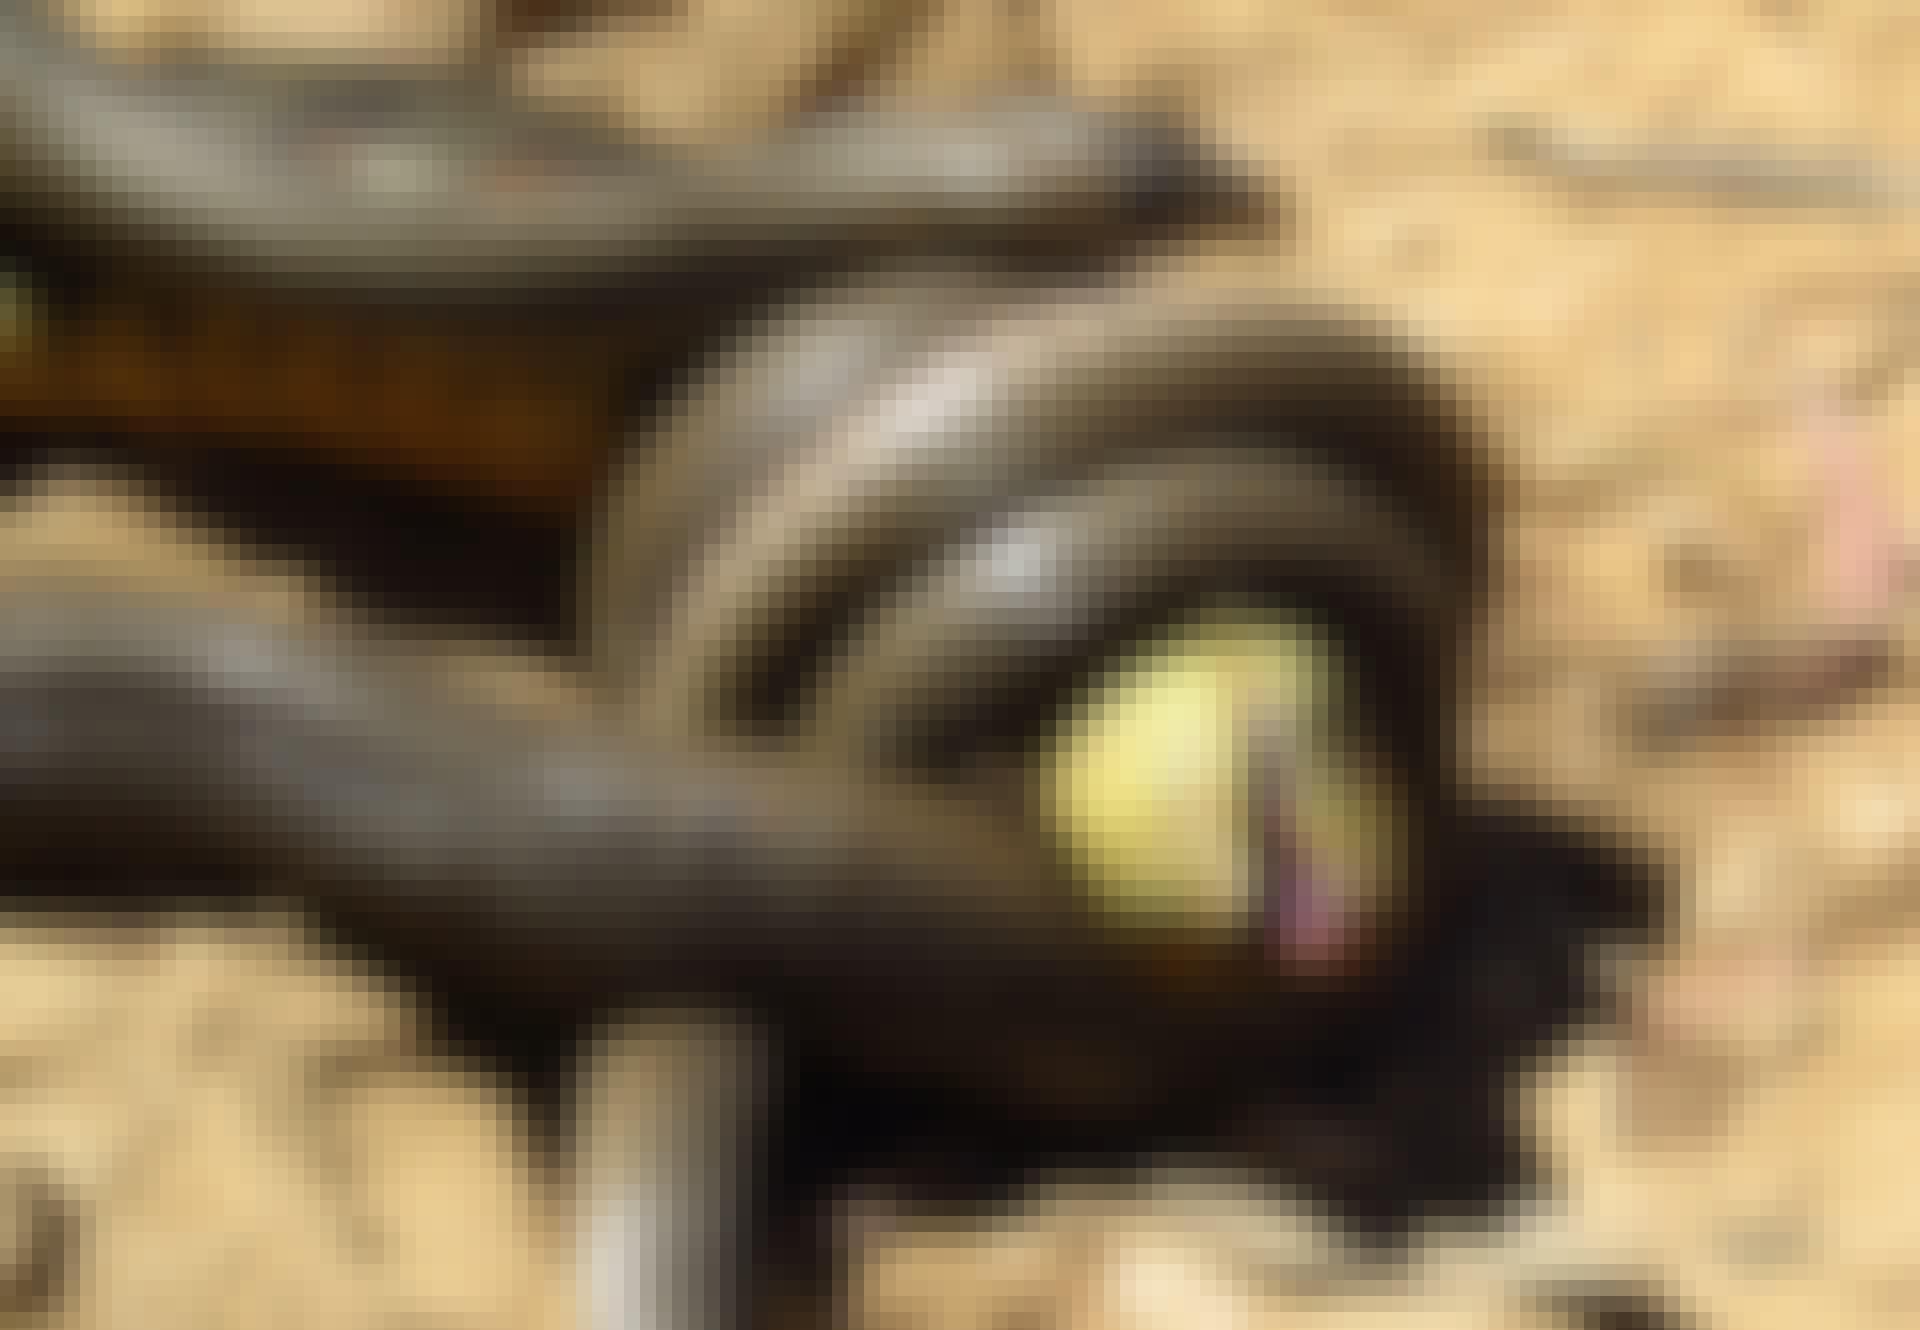 Giftigste slang ter wereld